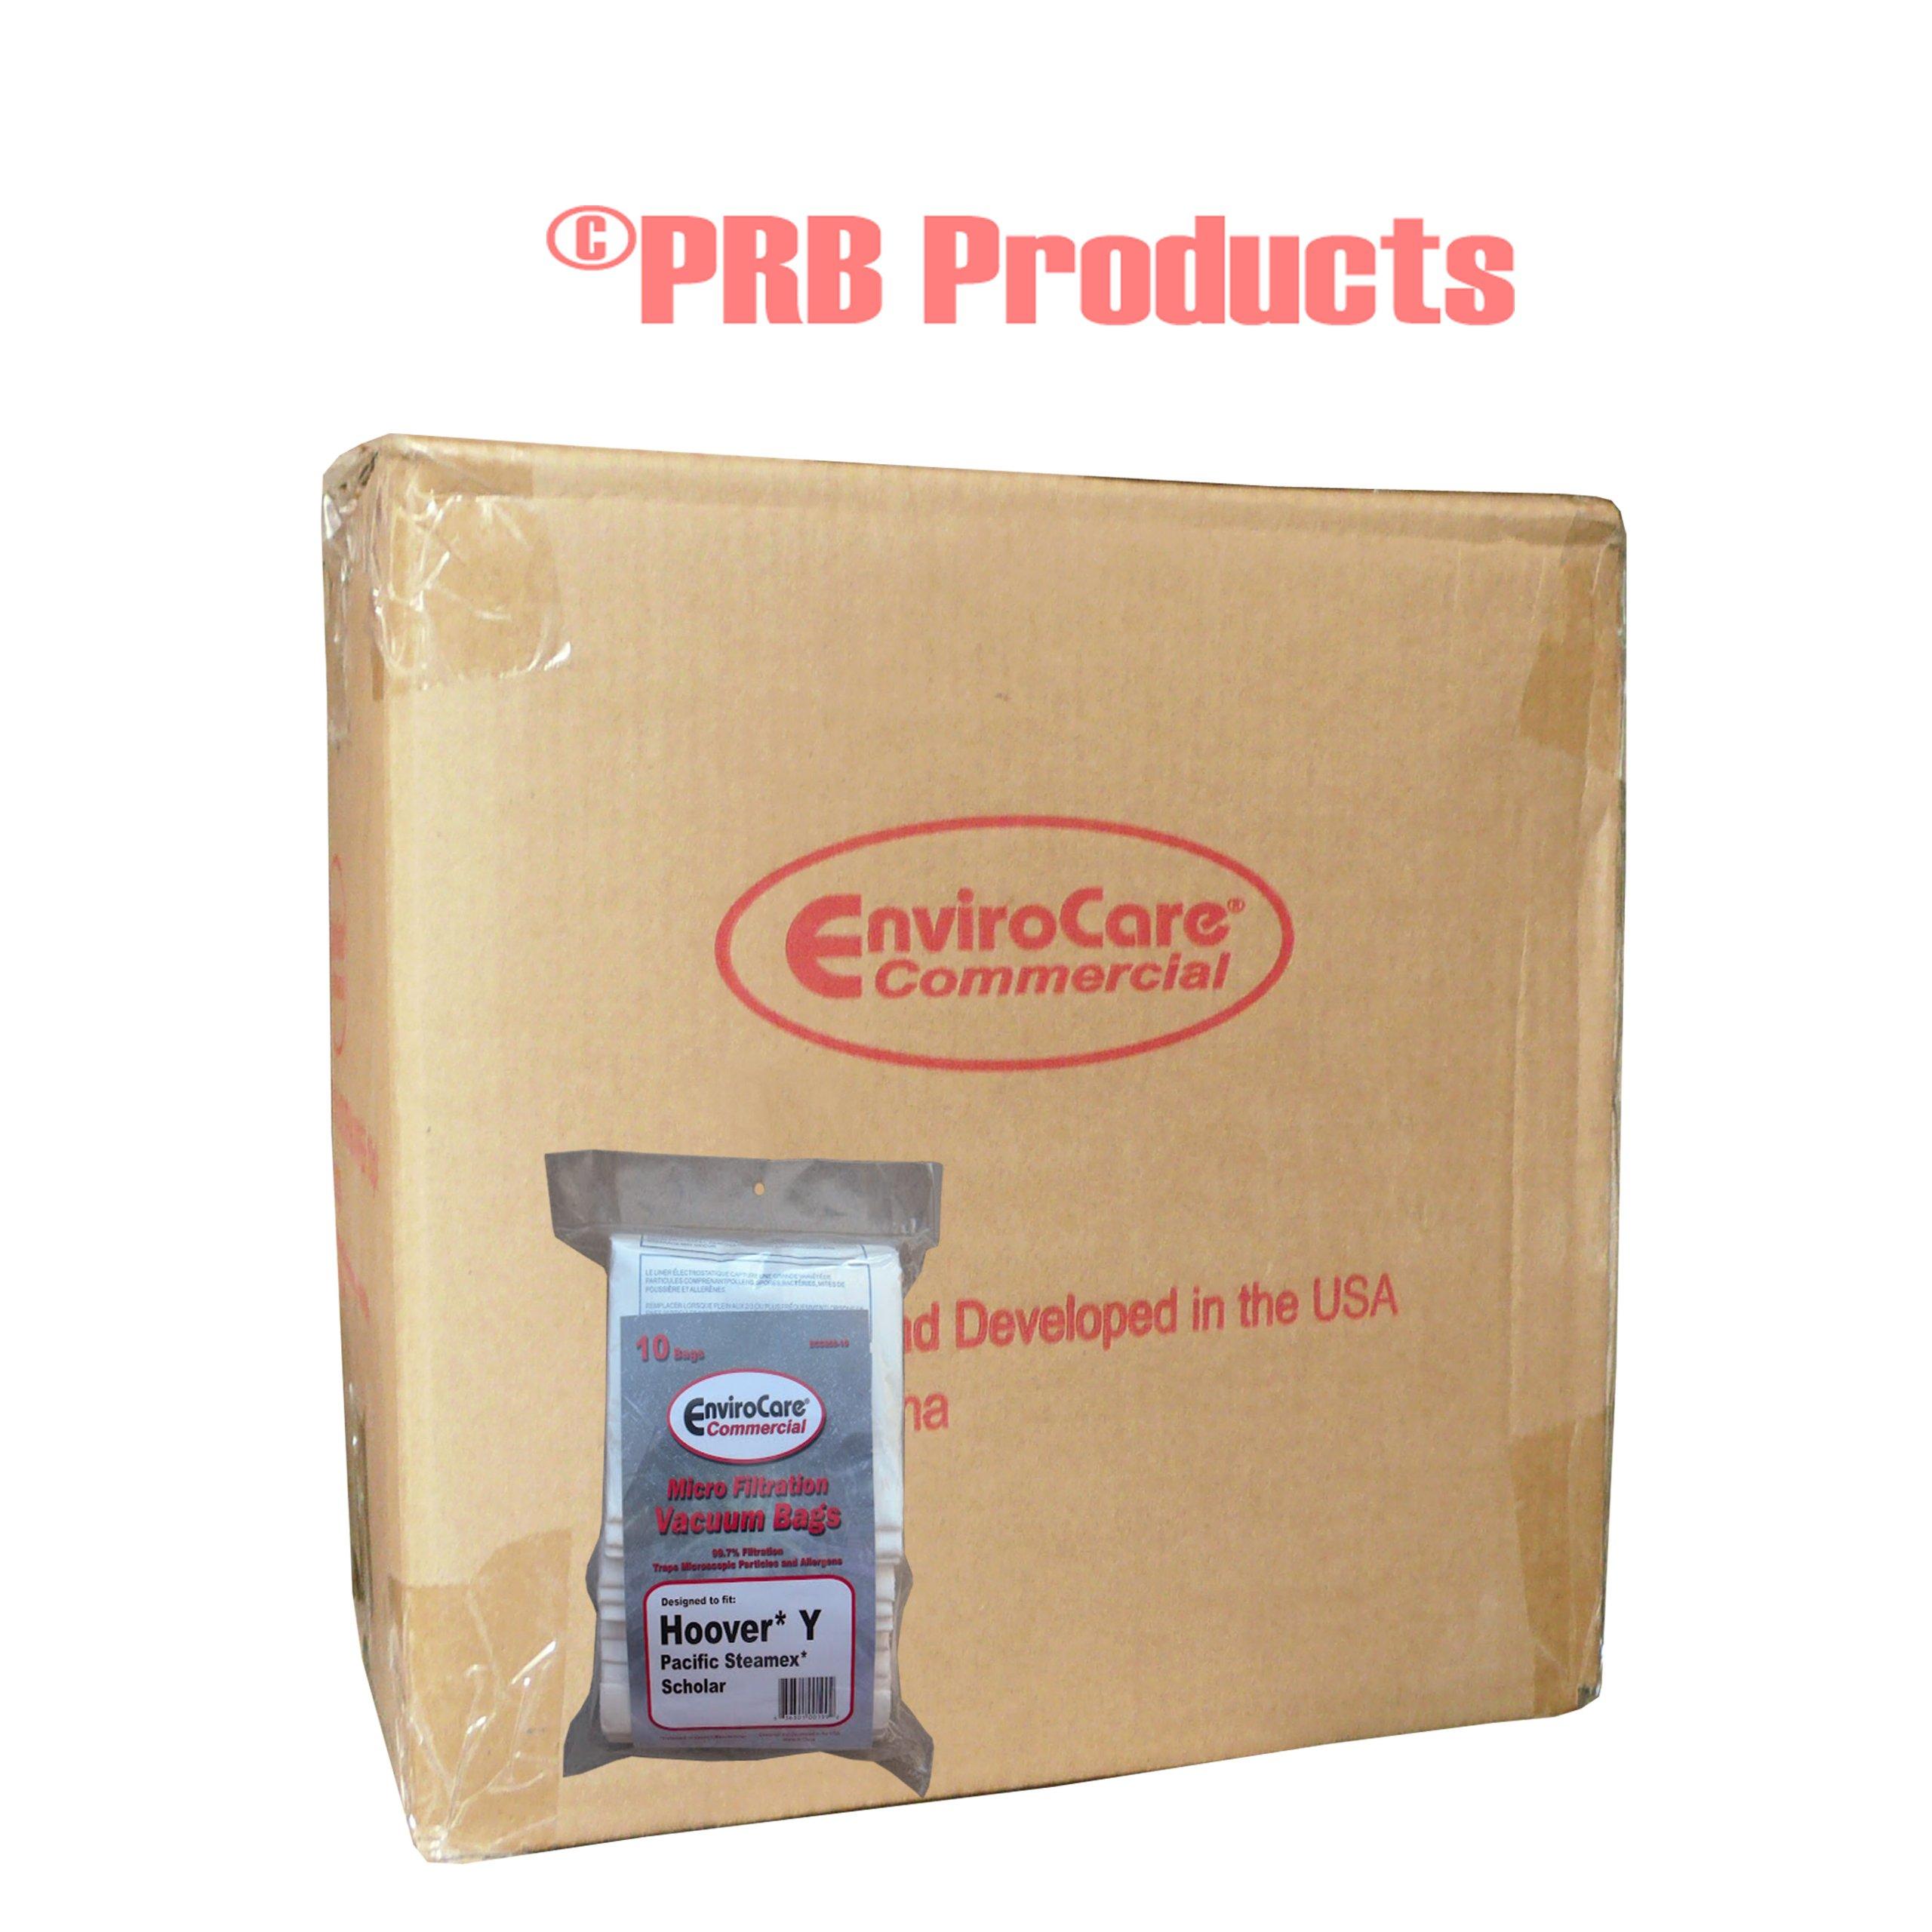 1 Case (10 pkgs) Hoover Commercial Allergy Type Y Bags, WindTunnel Upright Vacuum Cleaners, 43655109, 4010100Y, 4010801Y, AH10060DT,AH10040CLP,902419001